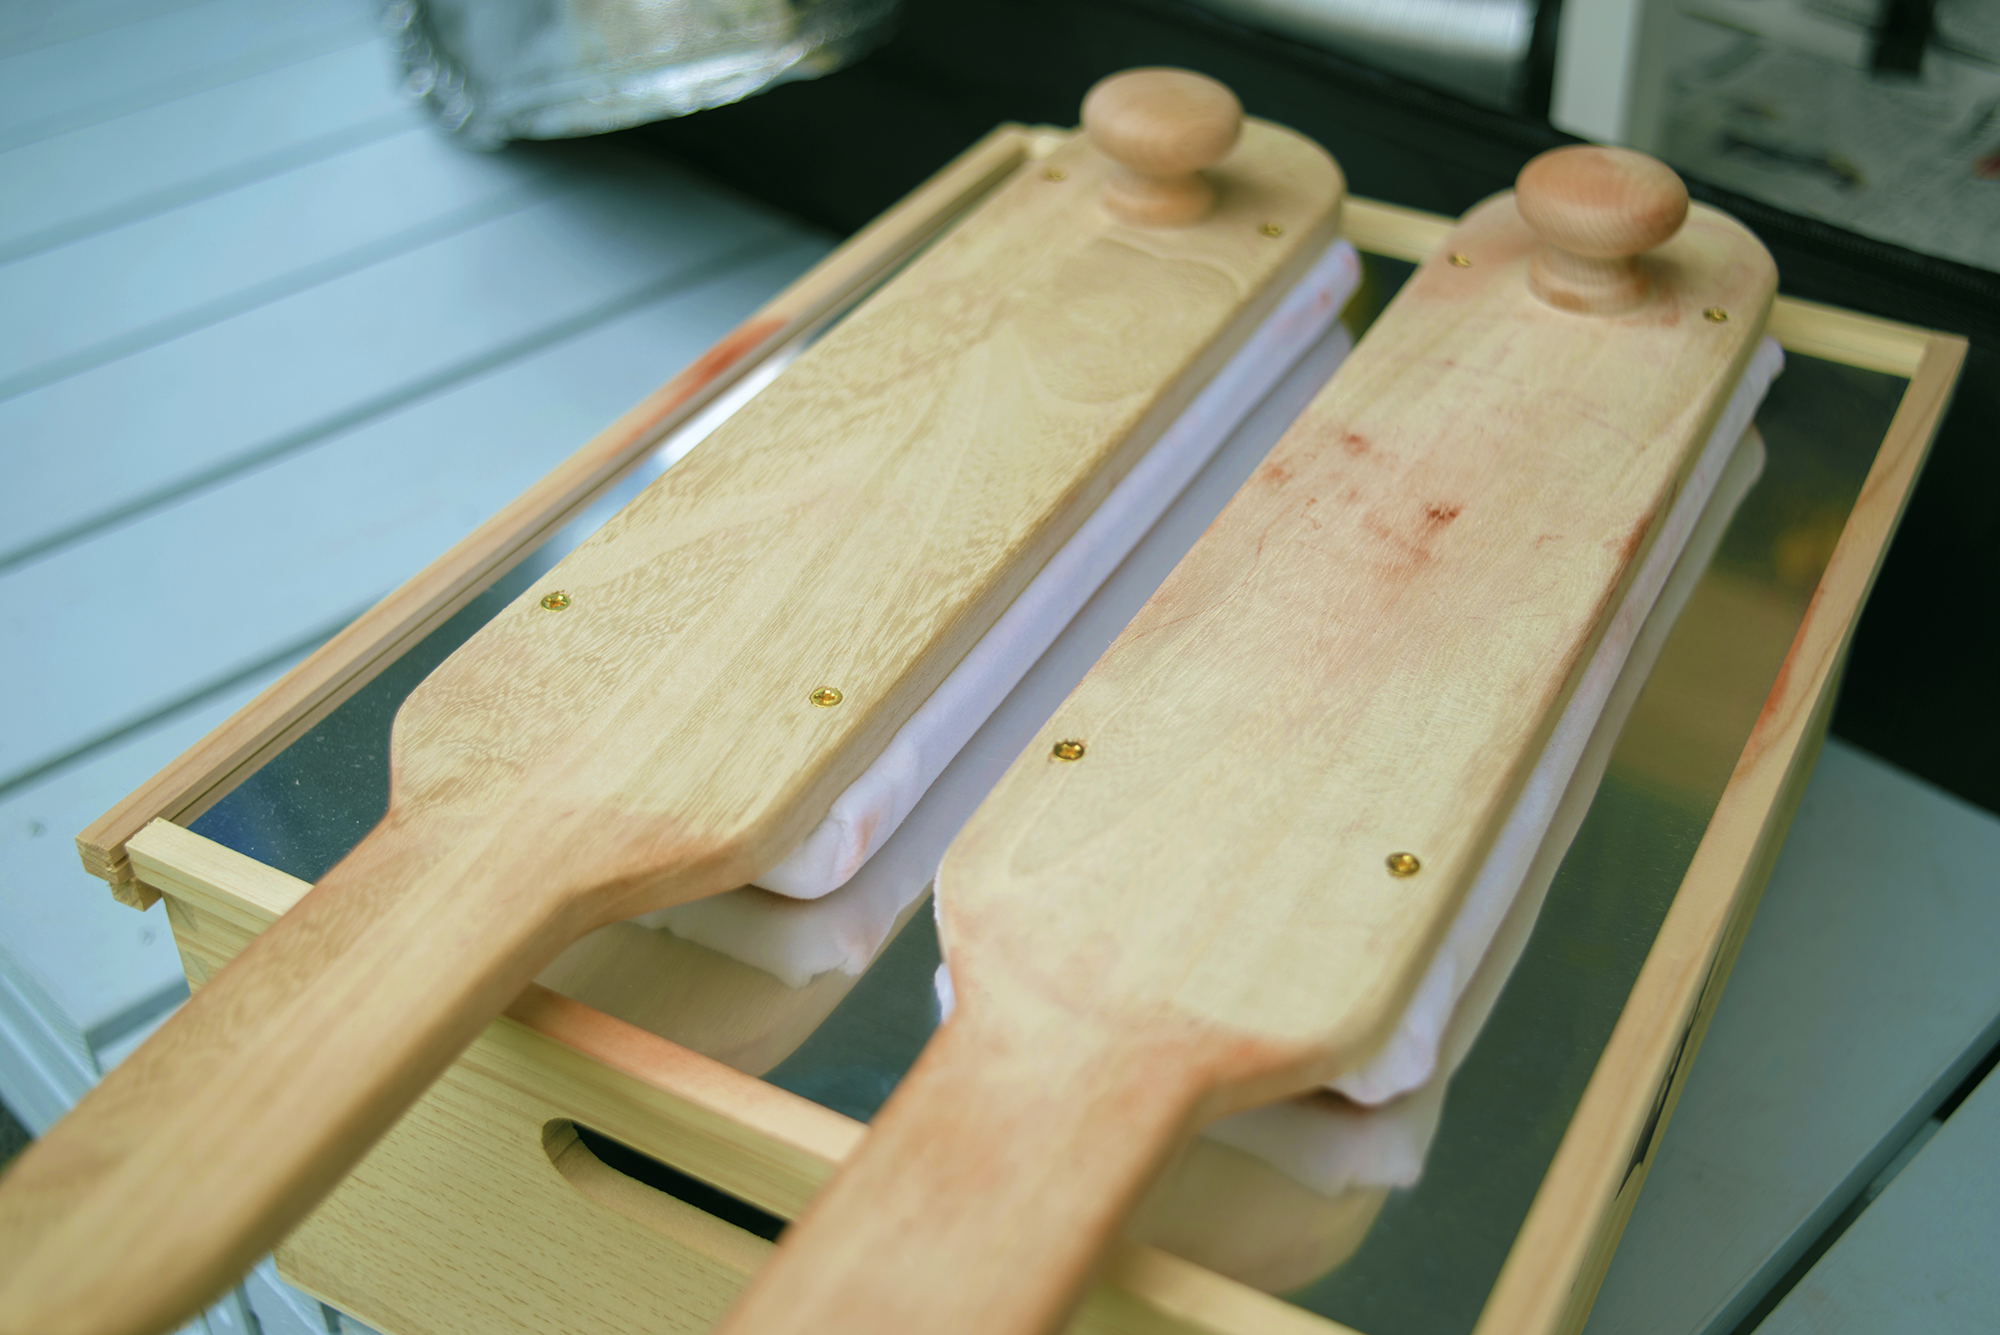 Hand-made buffing sticks to buff a silver plate for hours.  像が現れる銀板を数時間磨くためのハンドメイドのパドル と そのパドルを温める箱  상이 나타나는 은판을 몇 시간 동안 닦기 위한 핸드메이드 페달과 그 패달을 데우는 상자